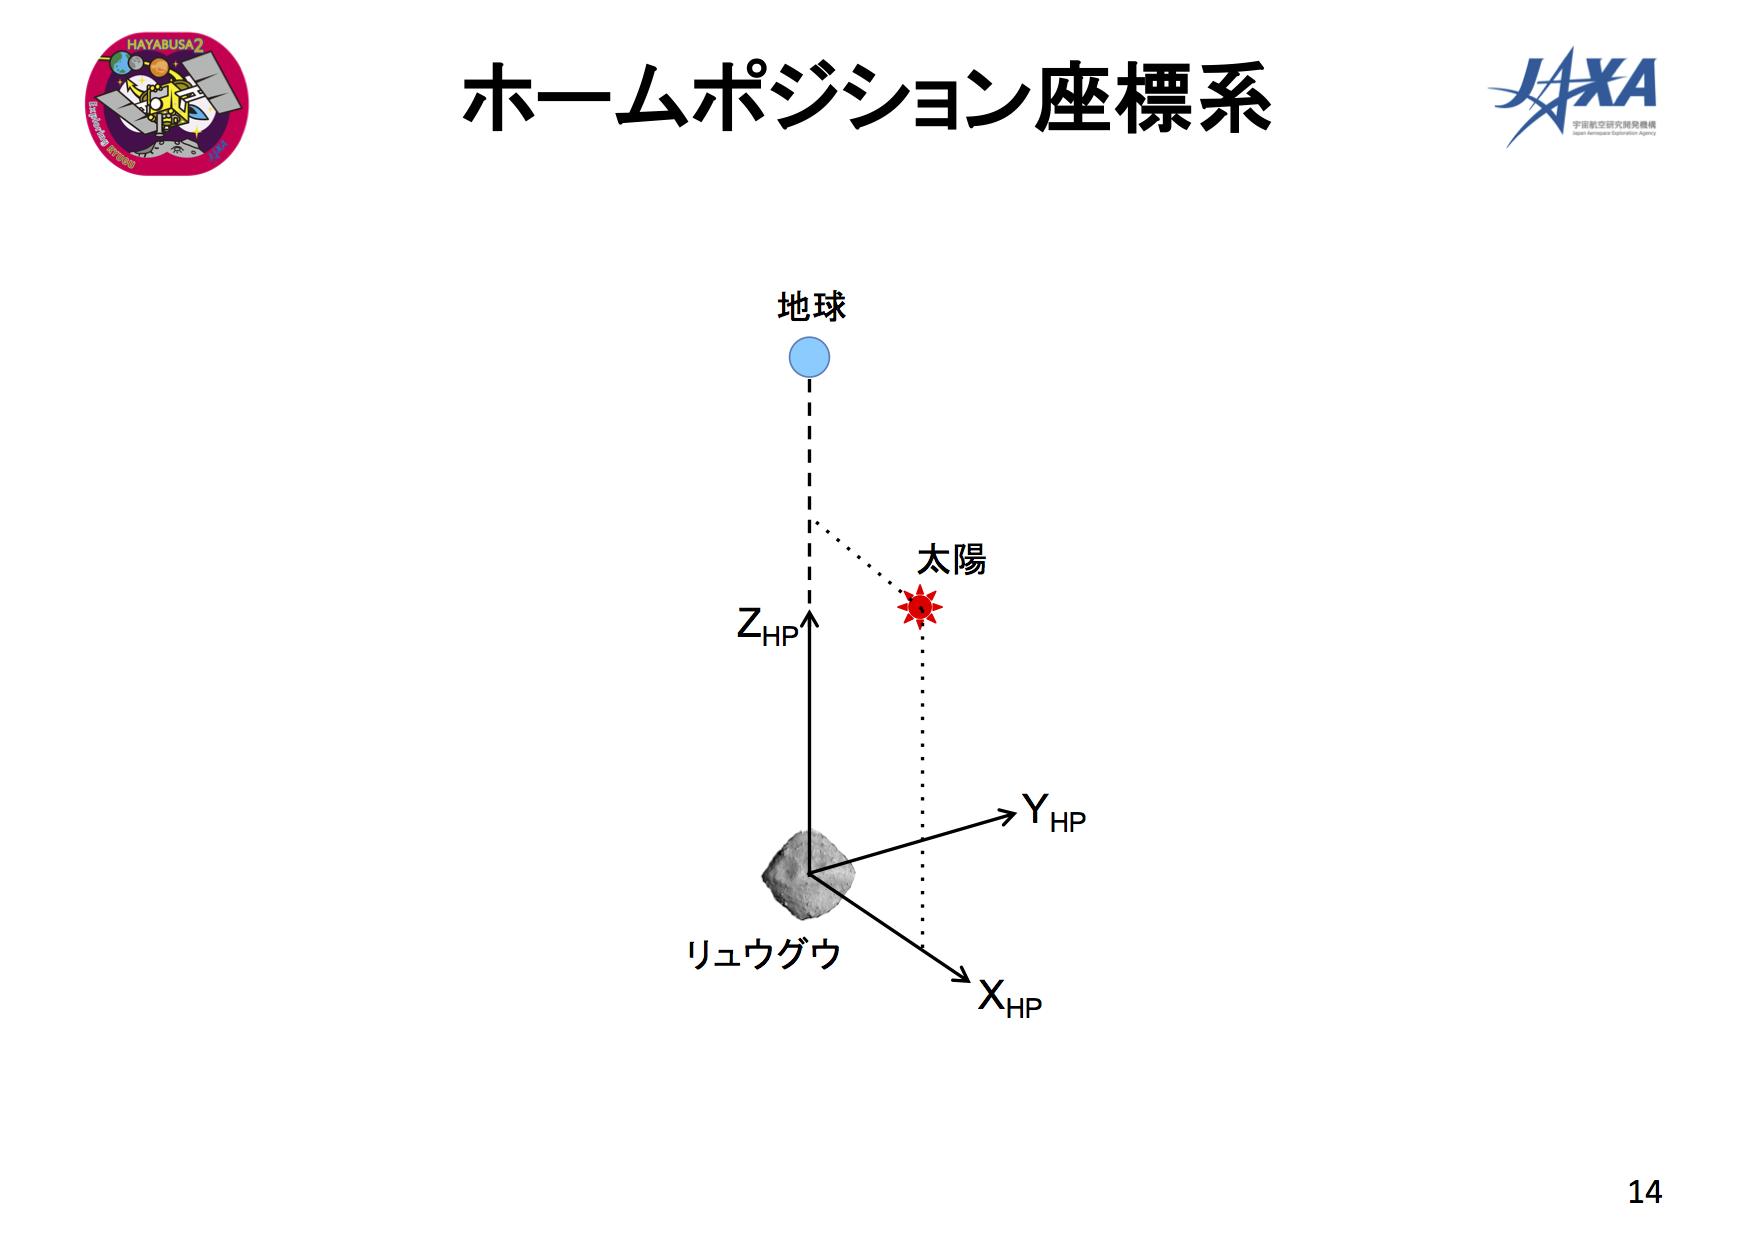 f:id:Imamura:20180921145504p:plain